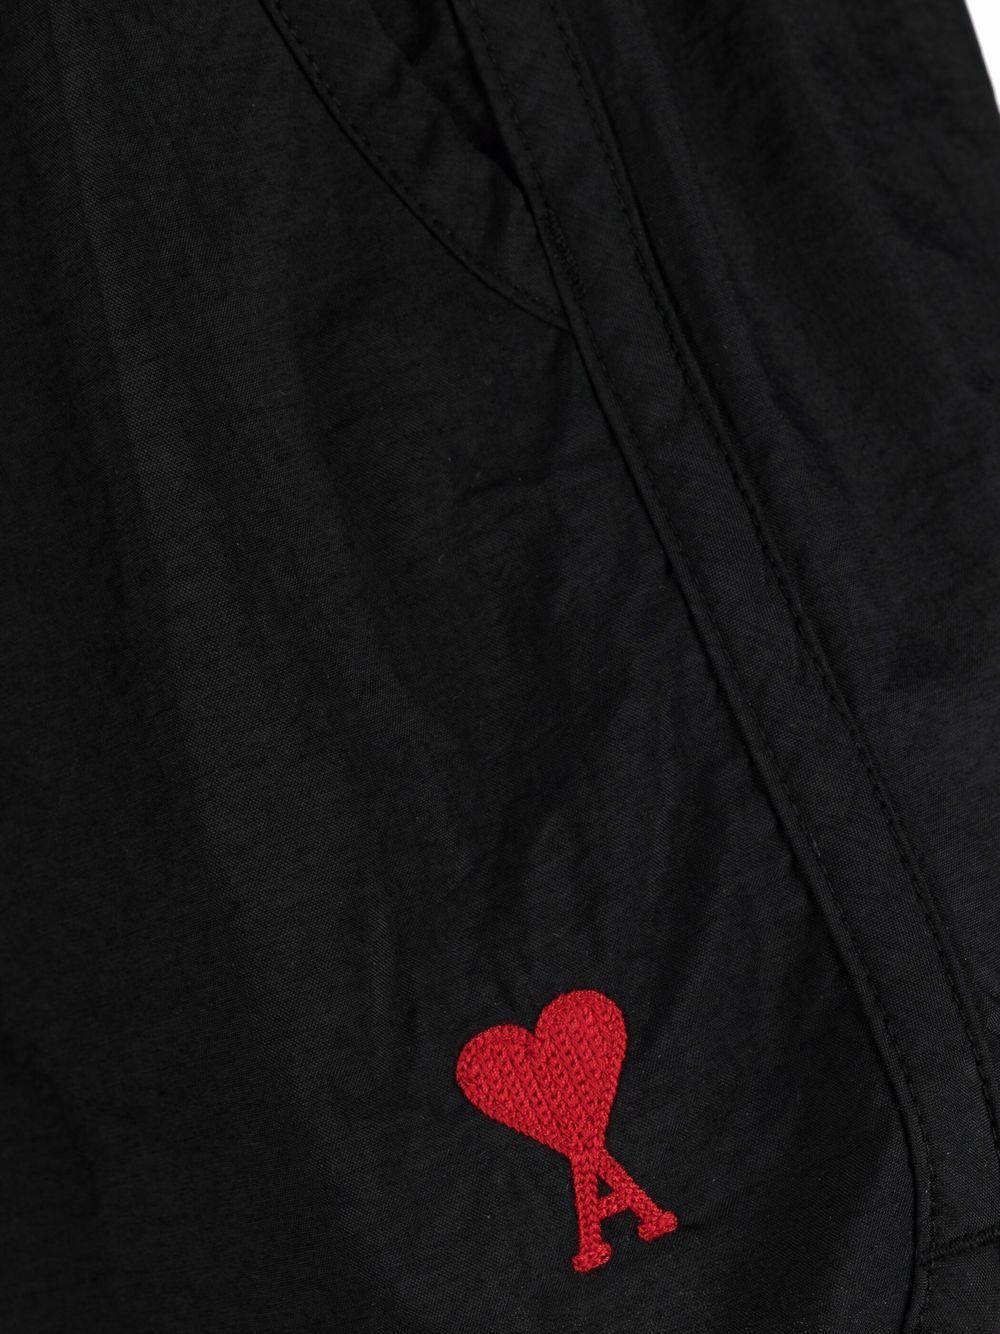 Ami Swimshort Black Man  AMI - ALEXANDRE MATTIUSSI   Swimwear   A21HBW01.393001